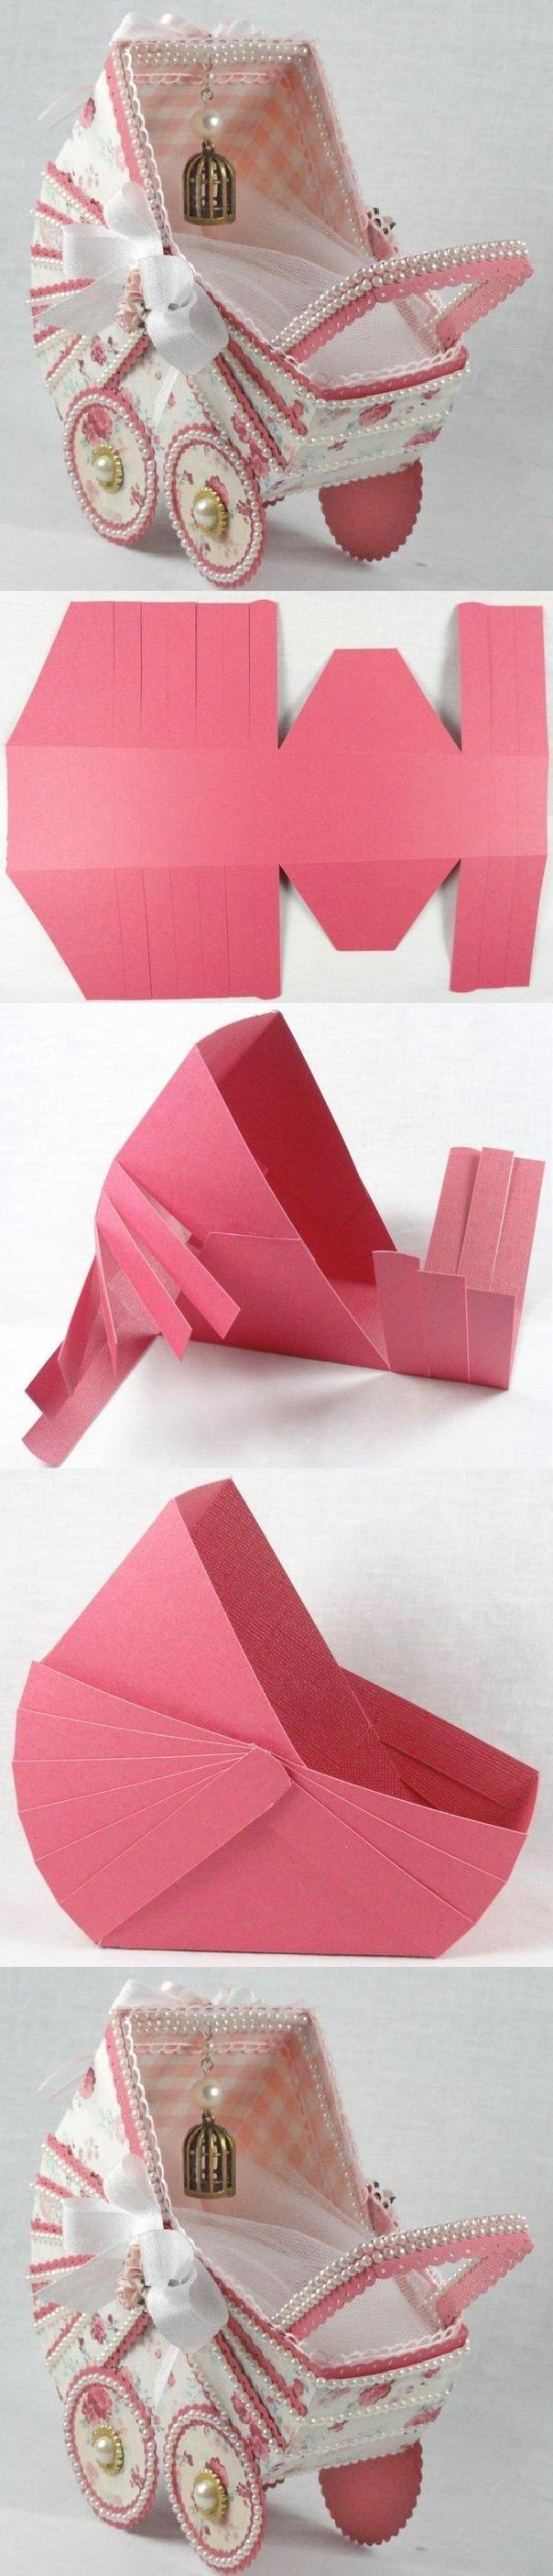 #KatieSheaDesign ♡❤ ❥ DIY Paper Stroller DIY Projects | UsefulDIY.com